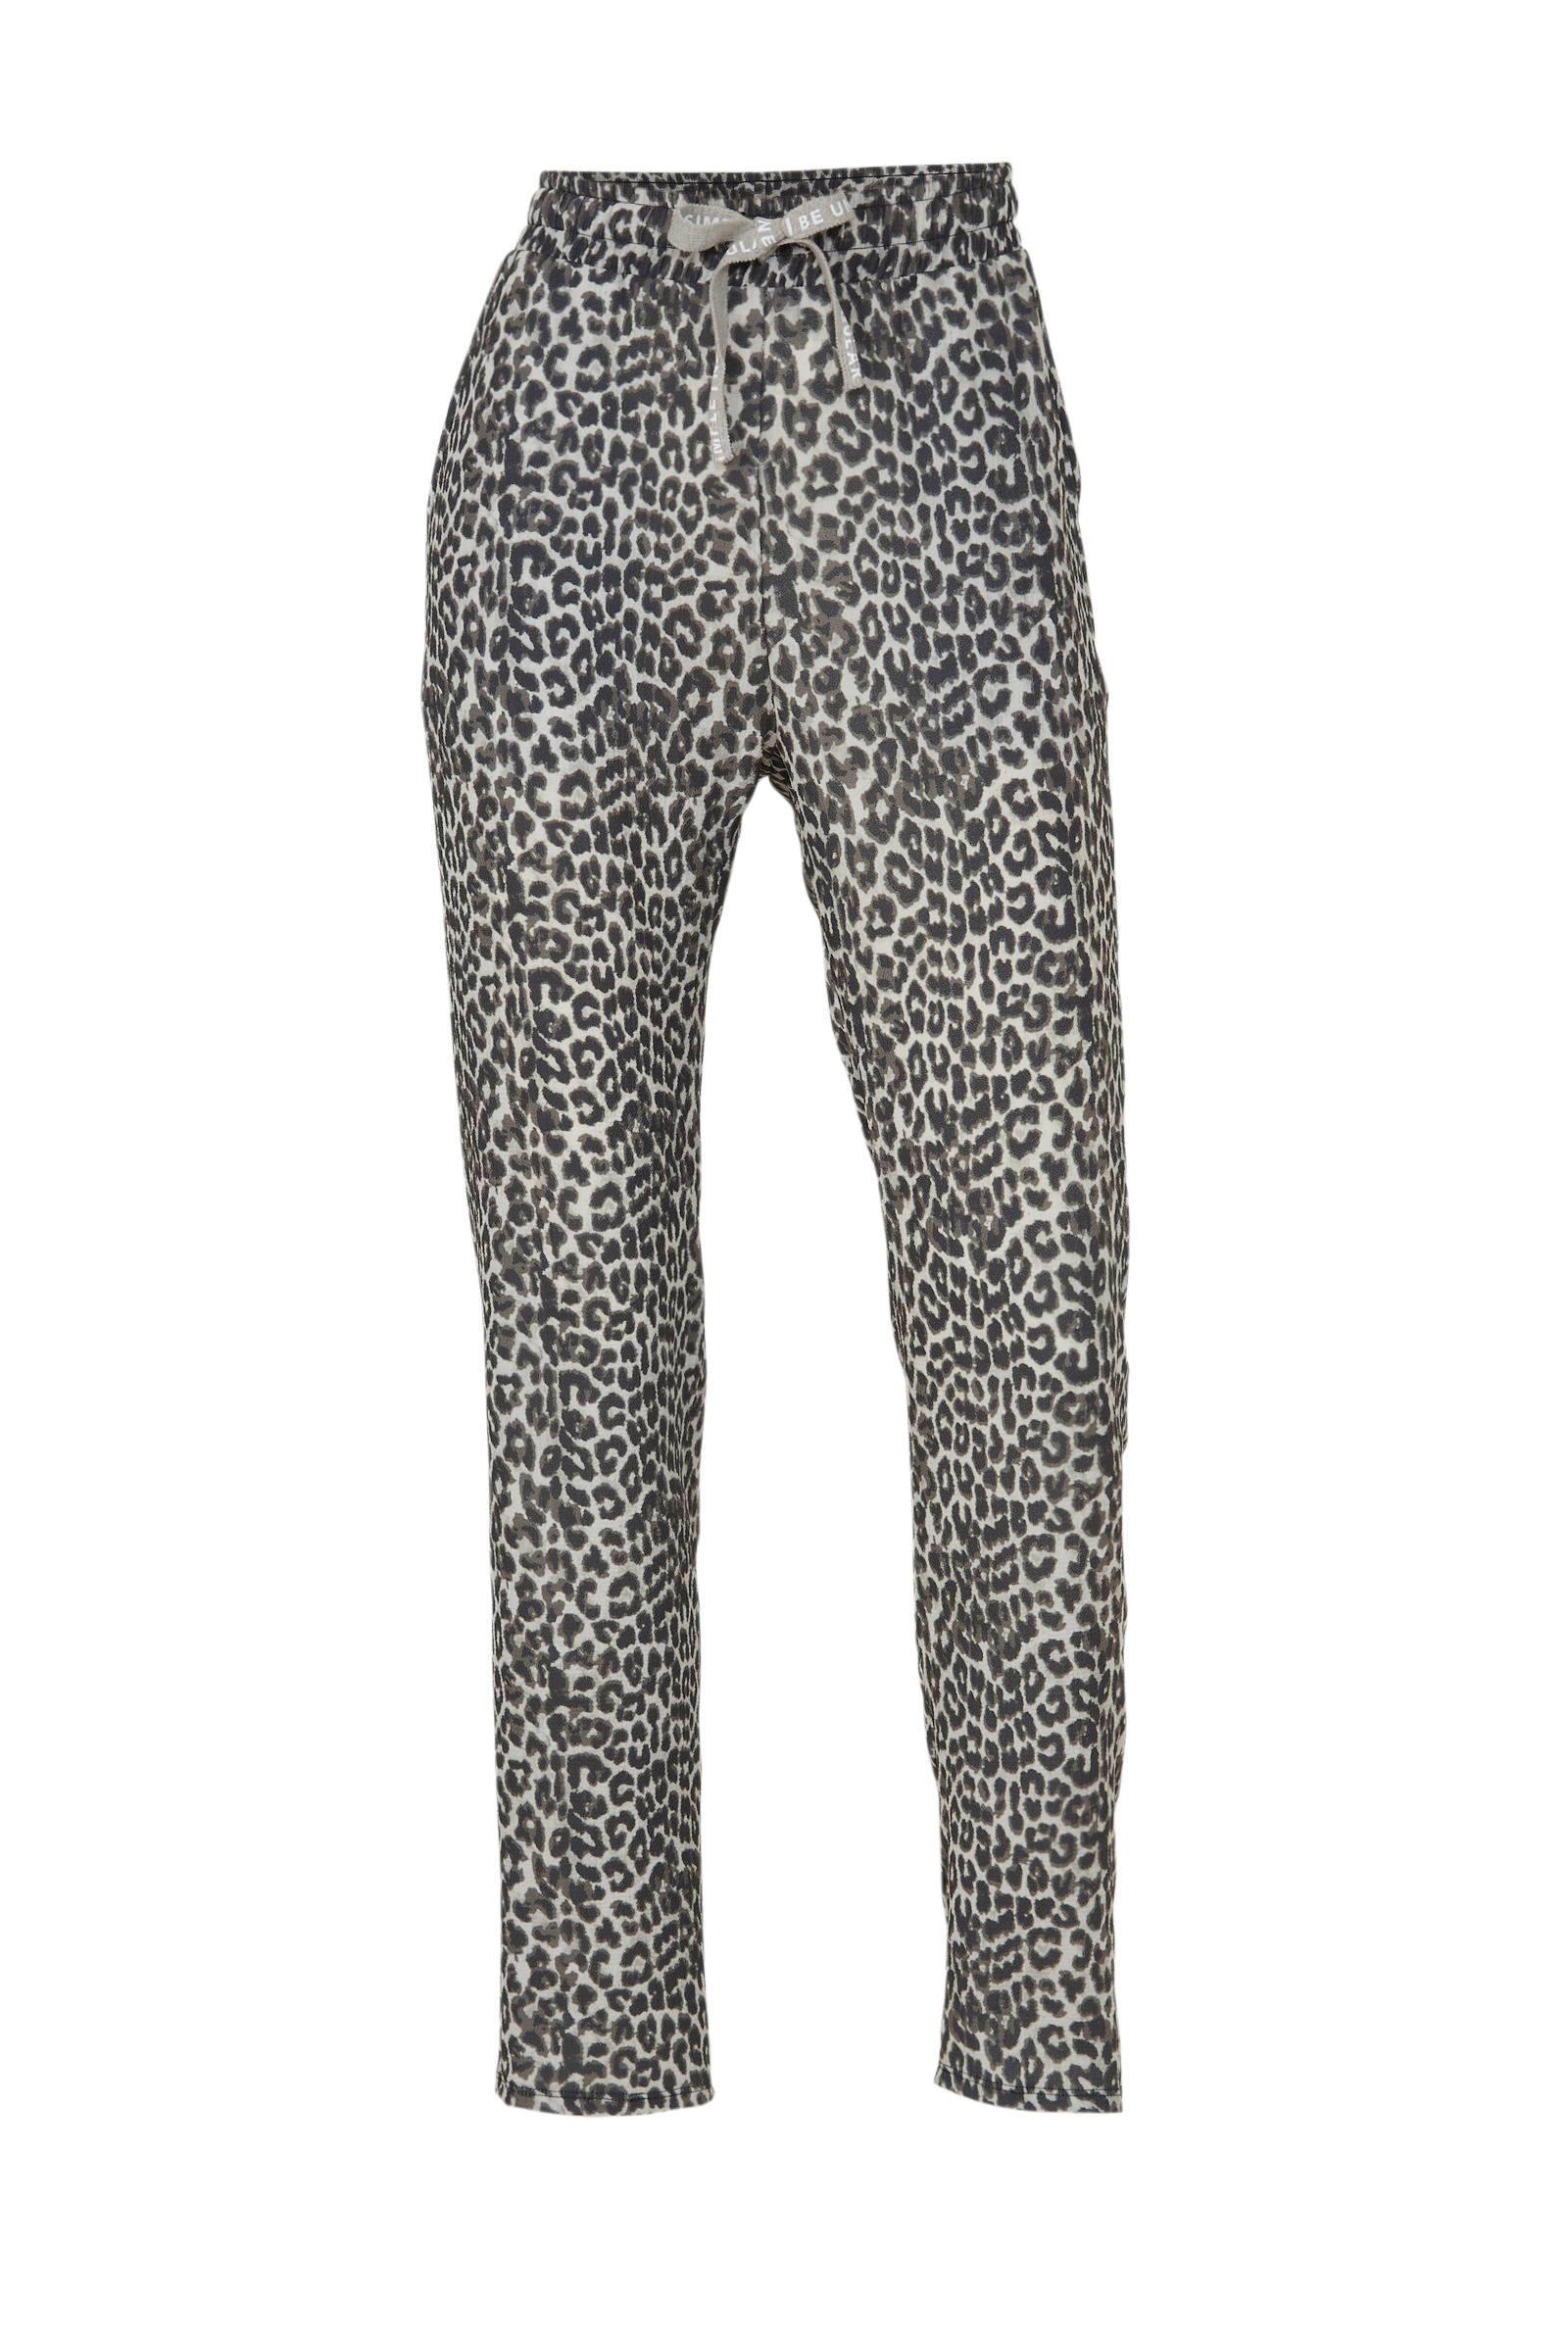 high waist tapered fit broek met panterprint grijs